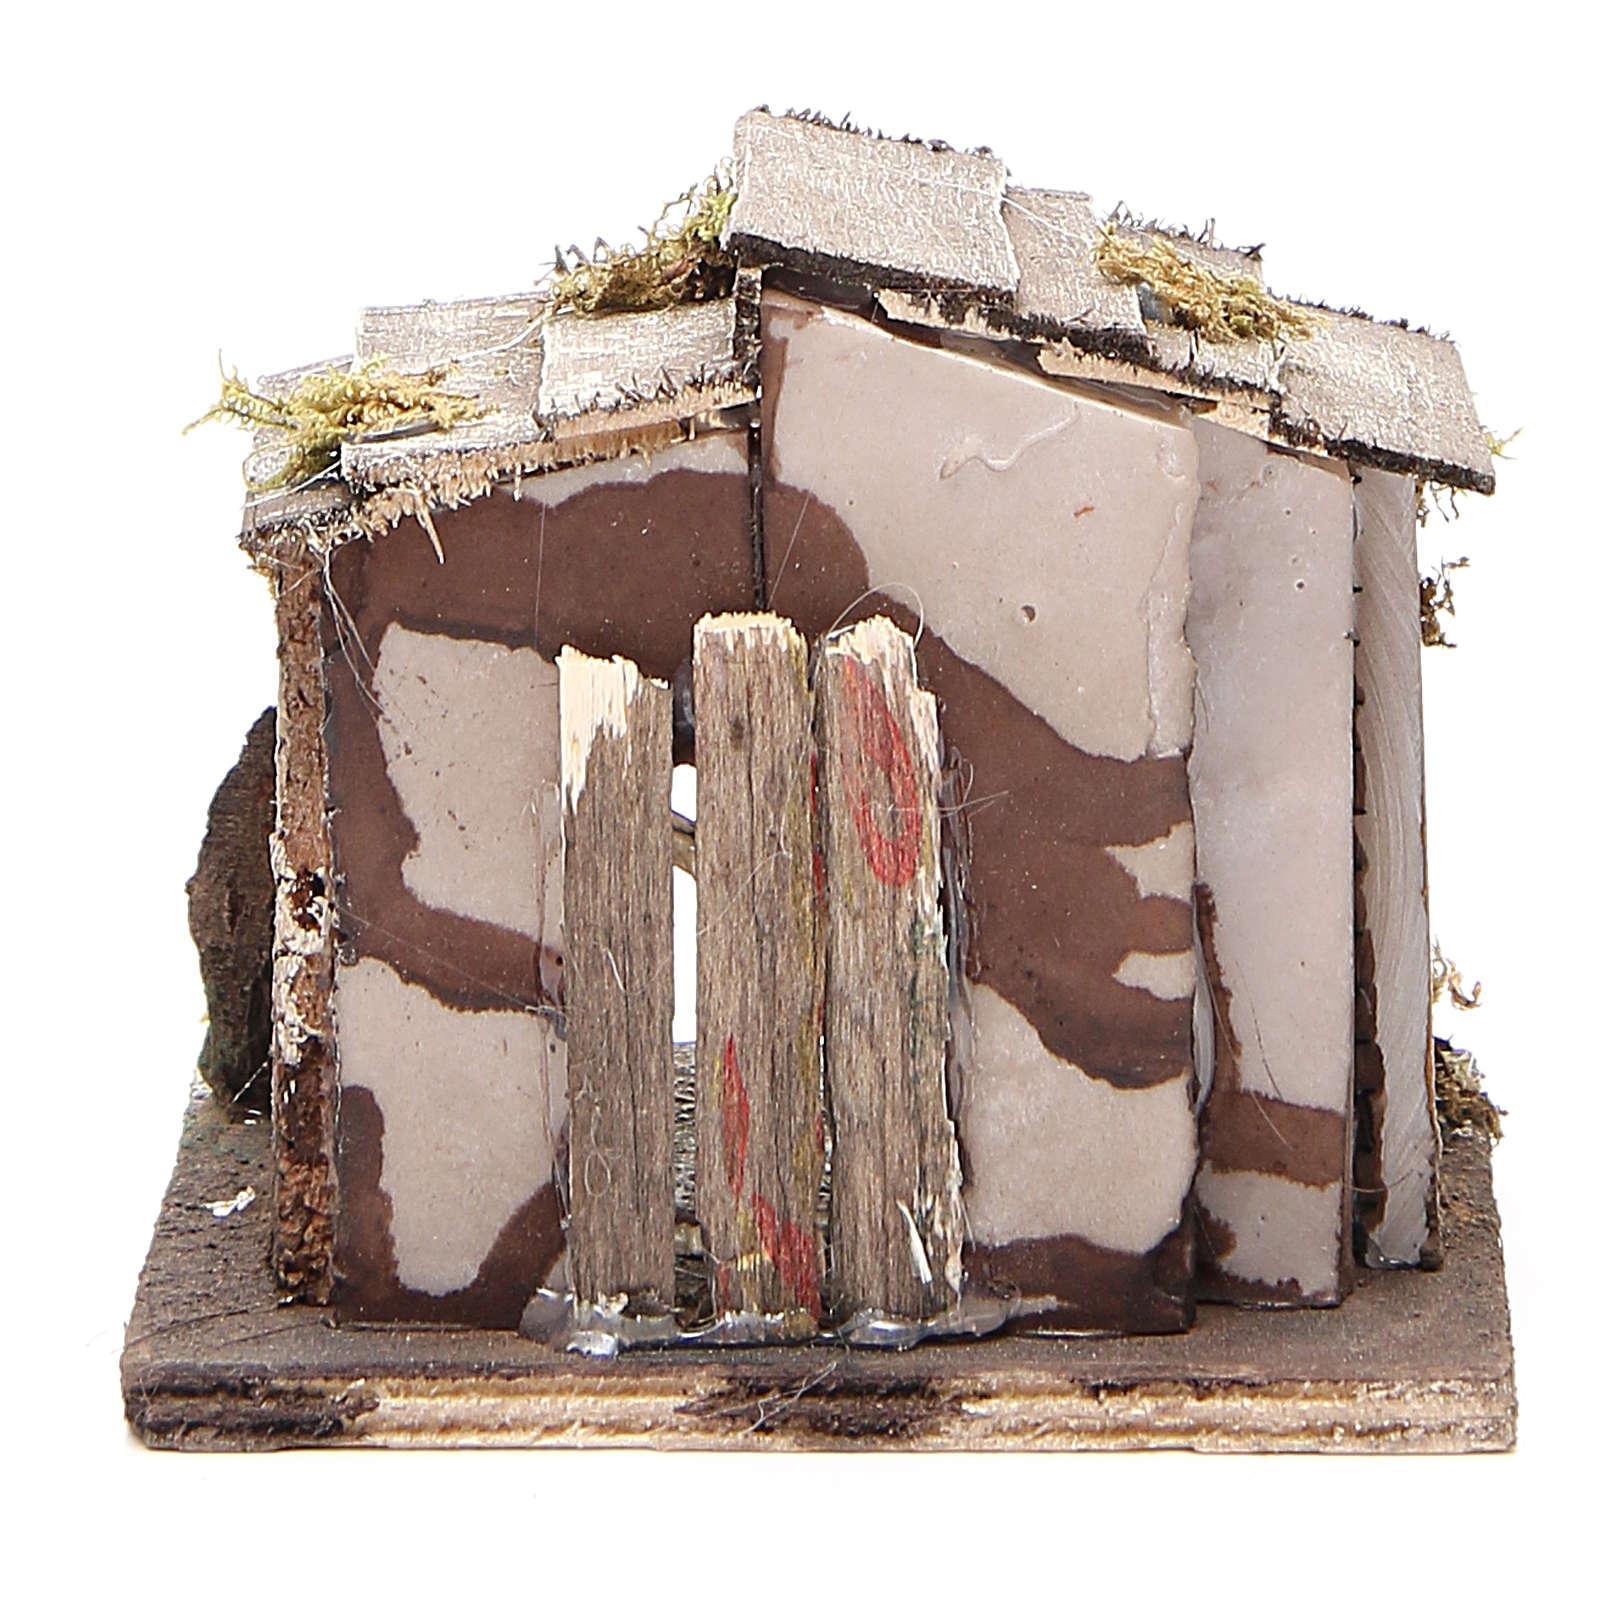 Capanna legno presepe napoletano 13x12x11 cm 4